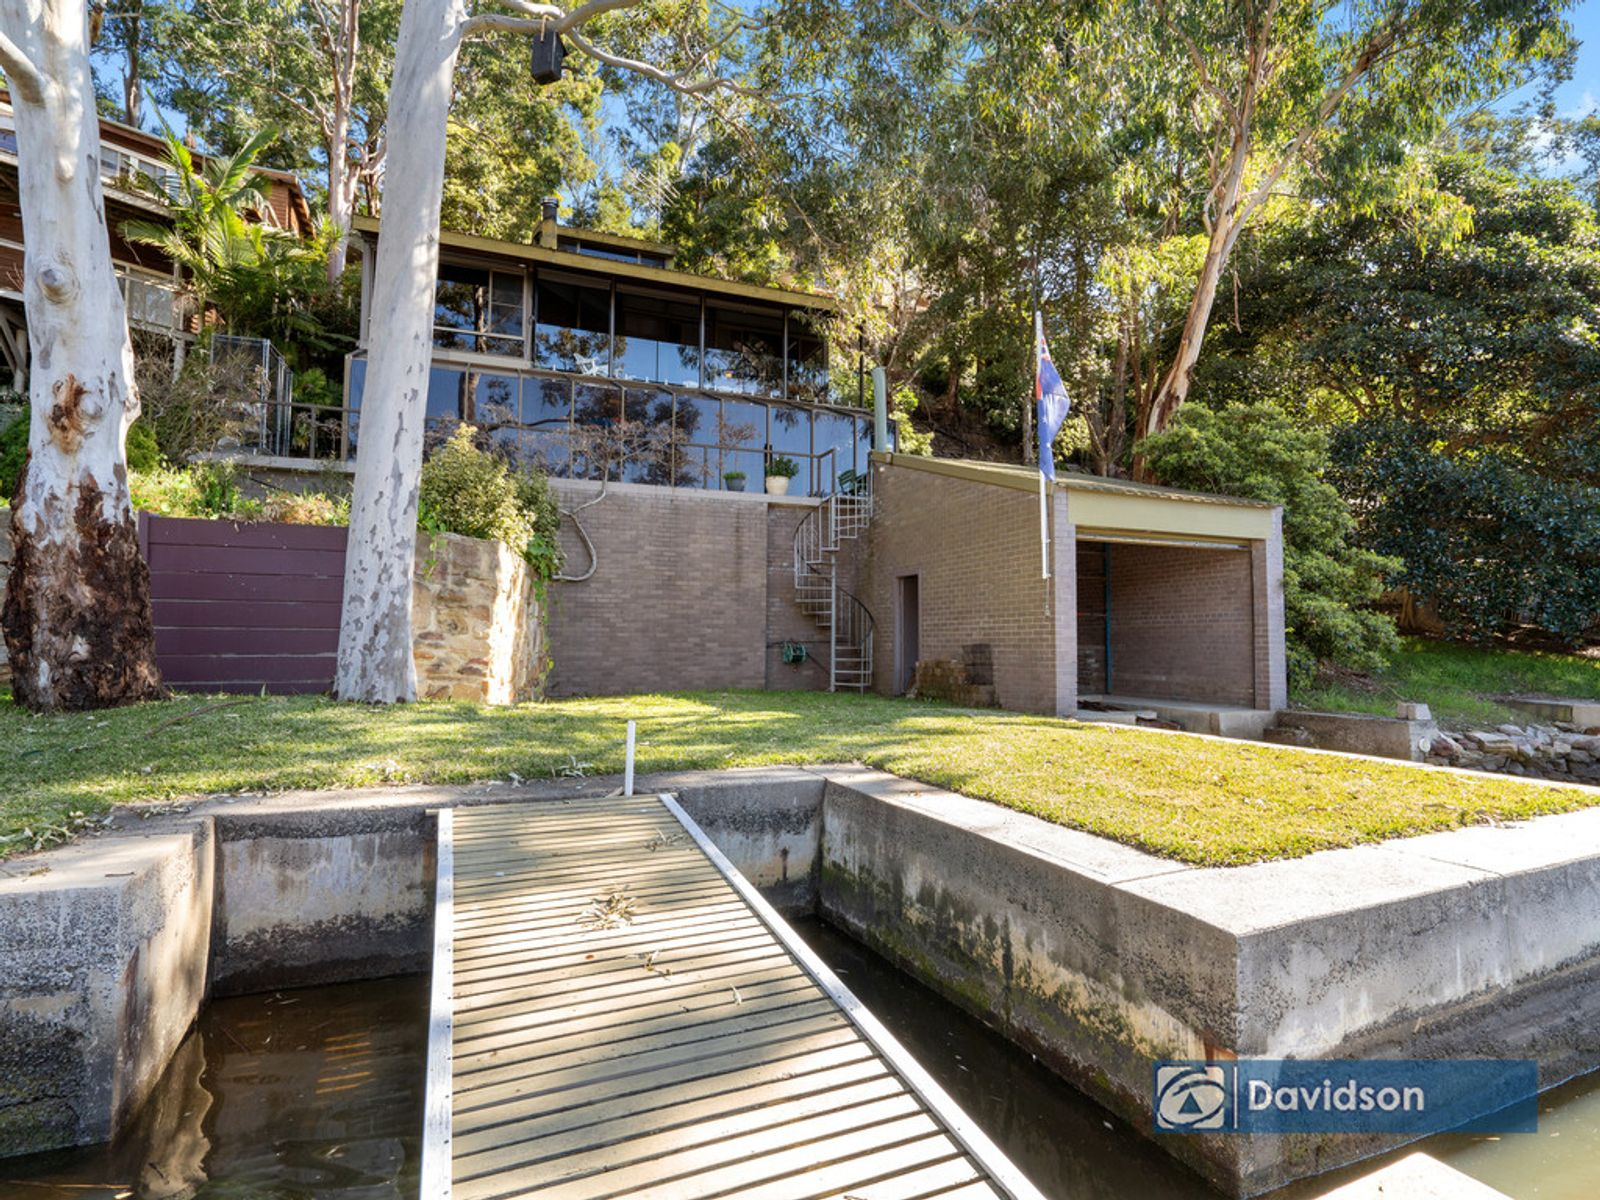 154 St George Crescent, Sandy Point, NSW 2172